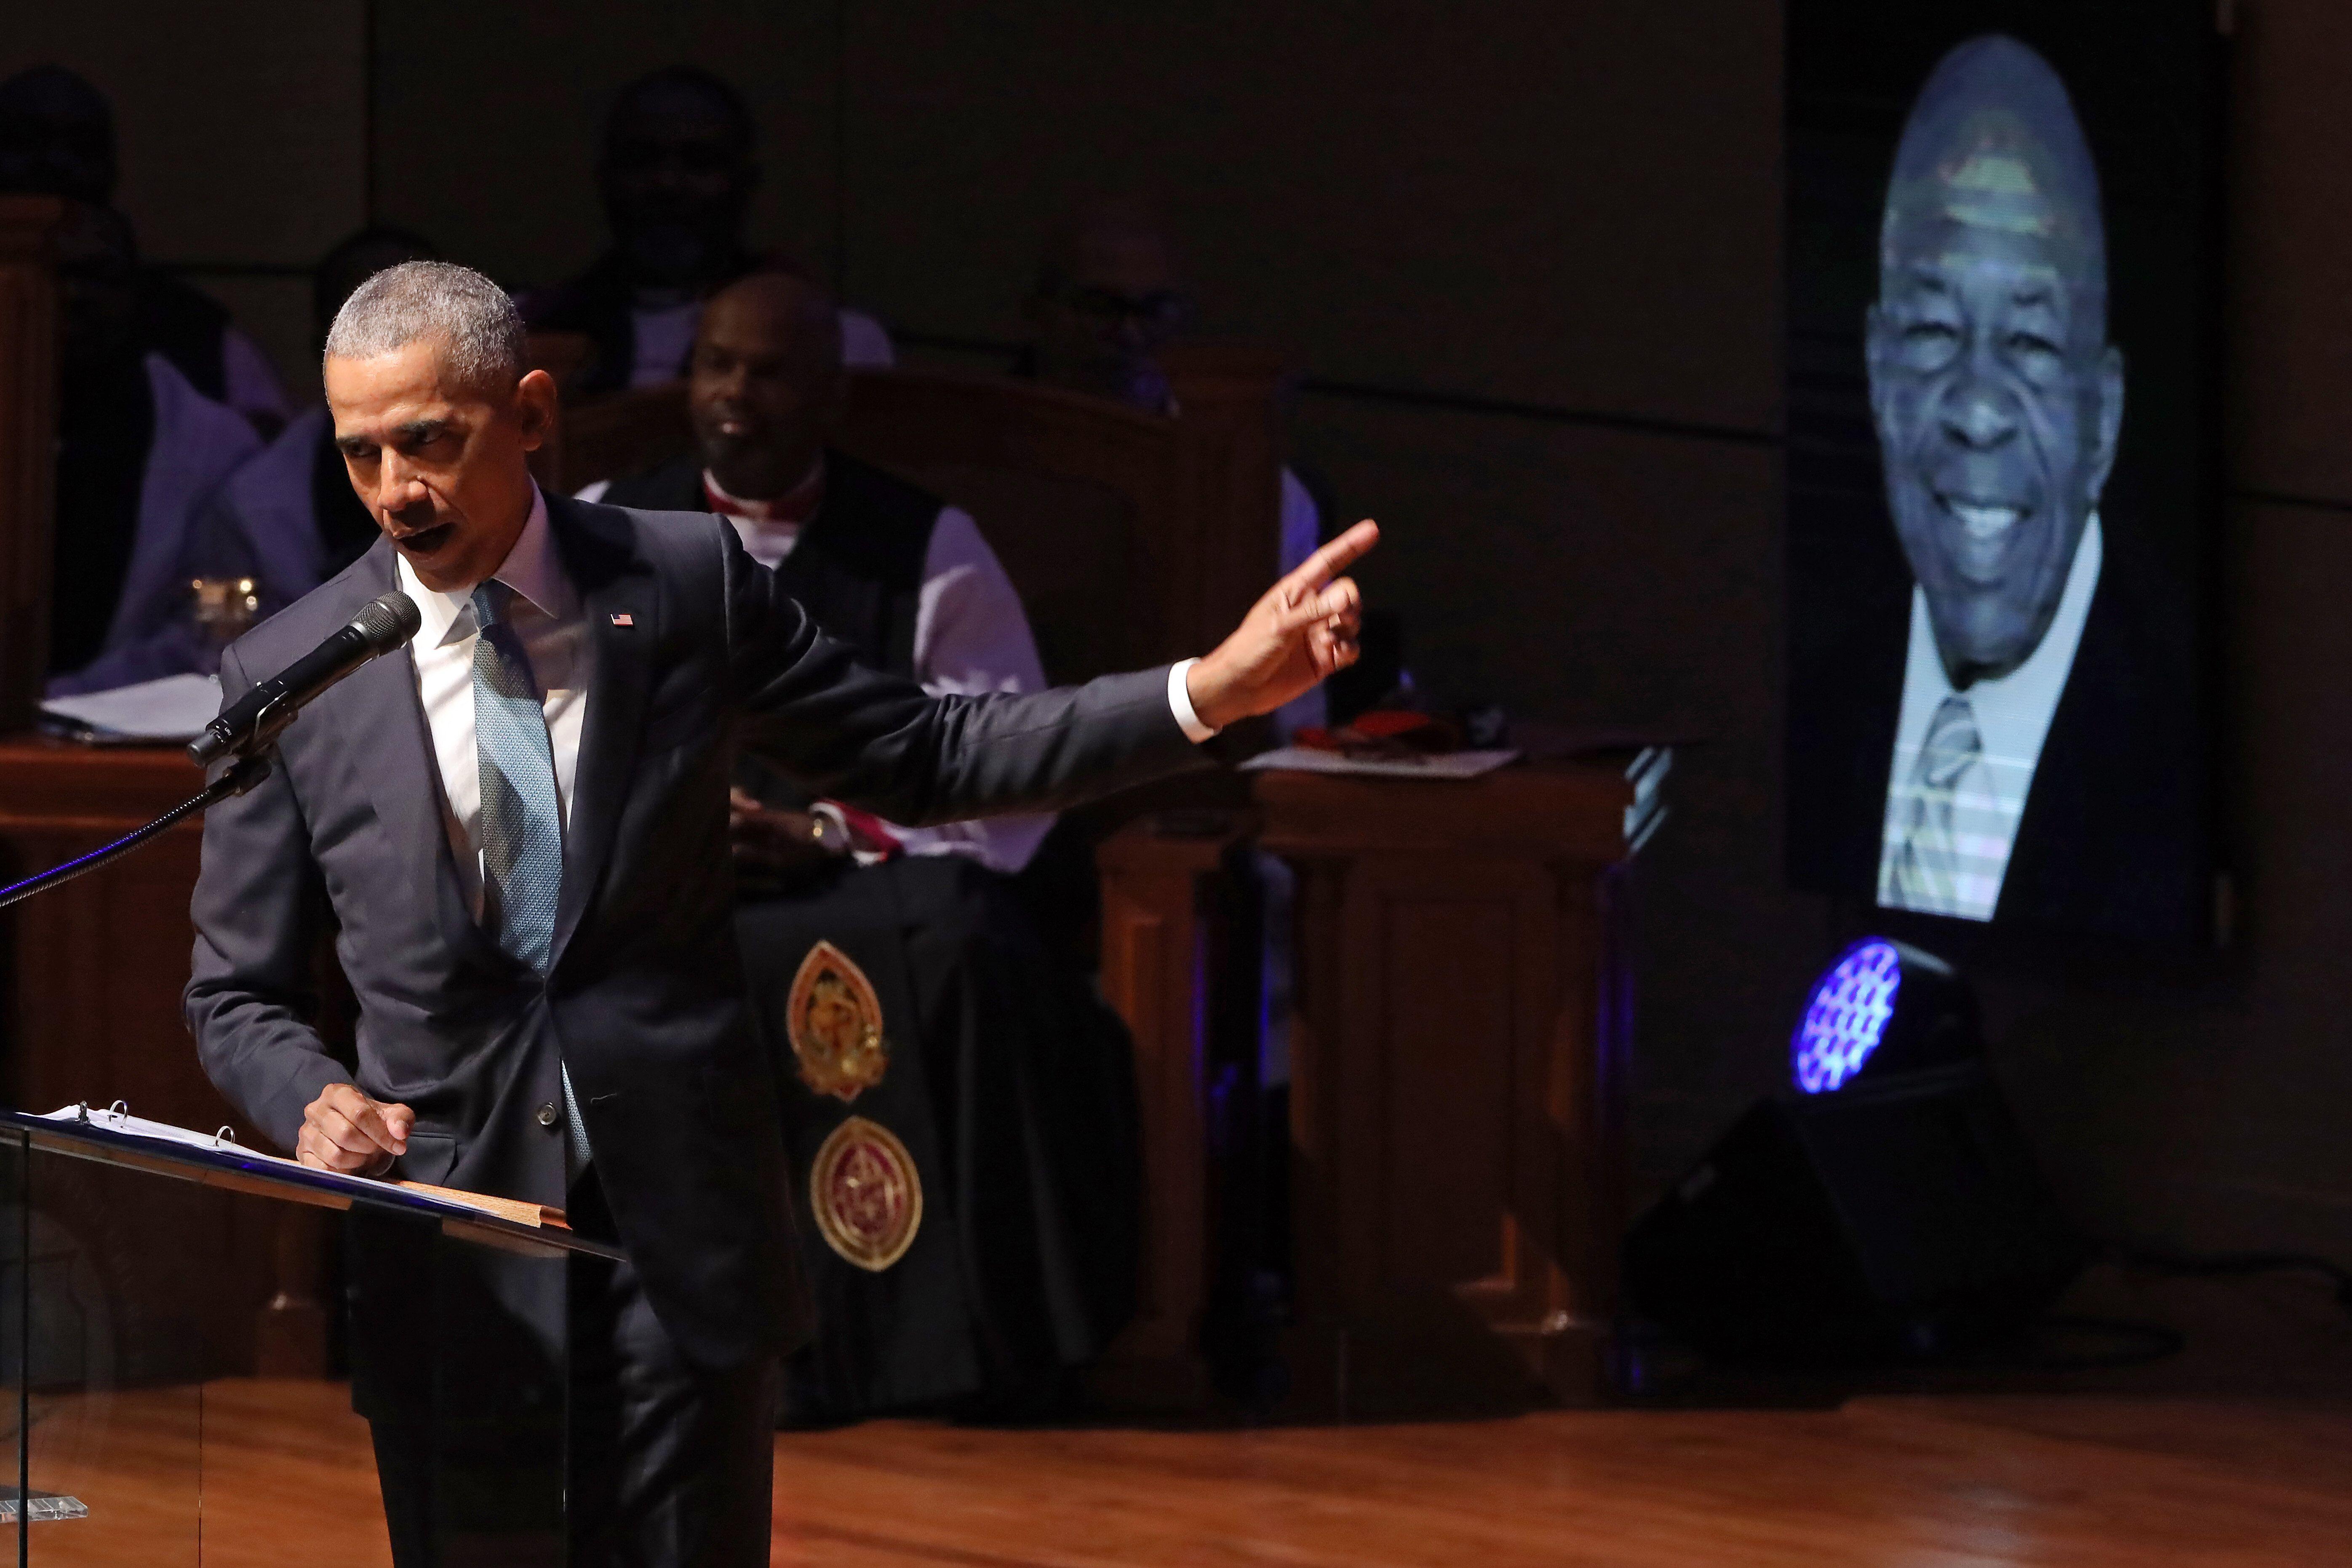 Former President Barack Obama delivers remarks during the funeral service for Rep. Elijah Cummings (D-MD) at New Psalmist Bap